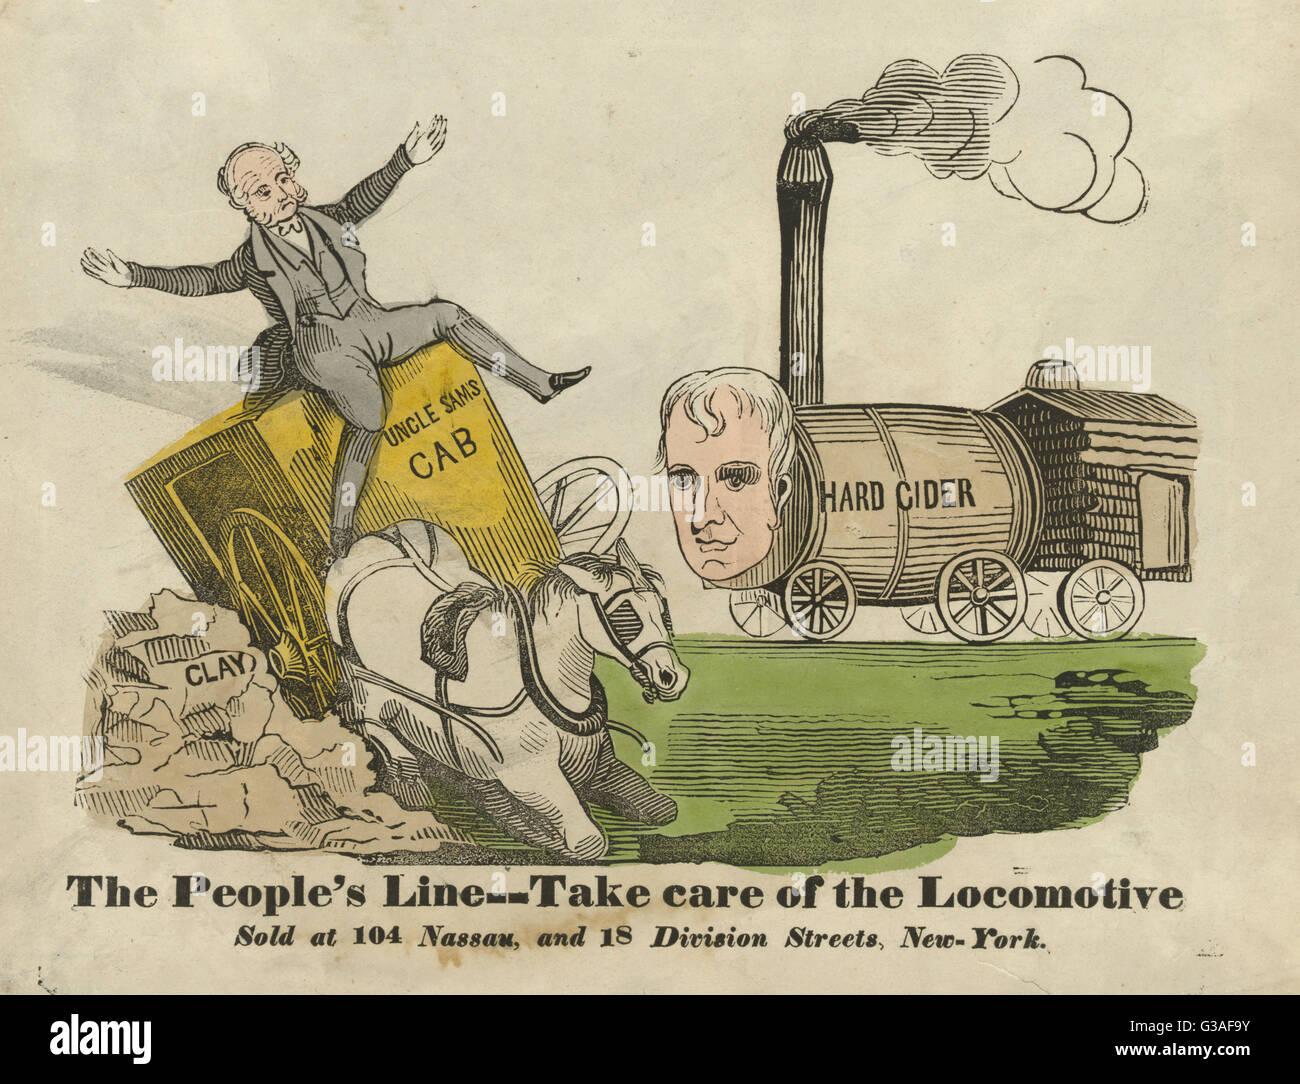 The people's line--Take care of the locomotive. Incumbent President Martin Van Buren drives Uncle Sam's - Stock Image